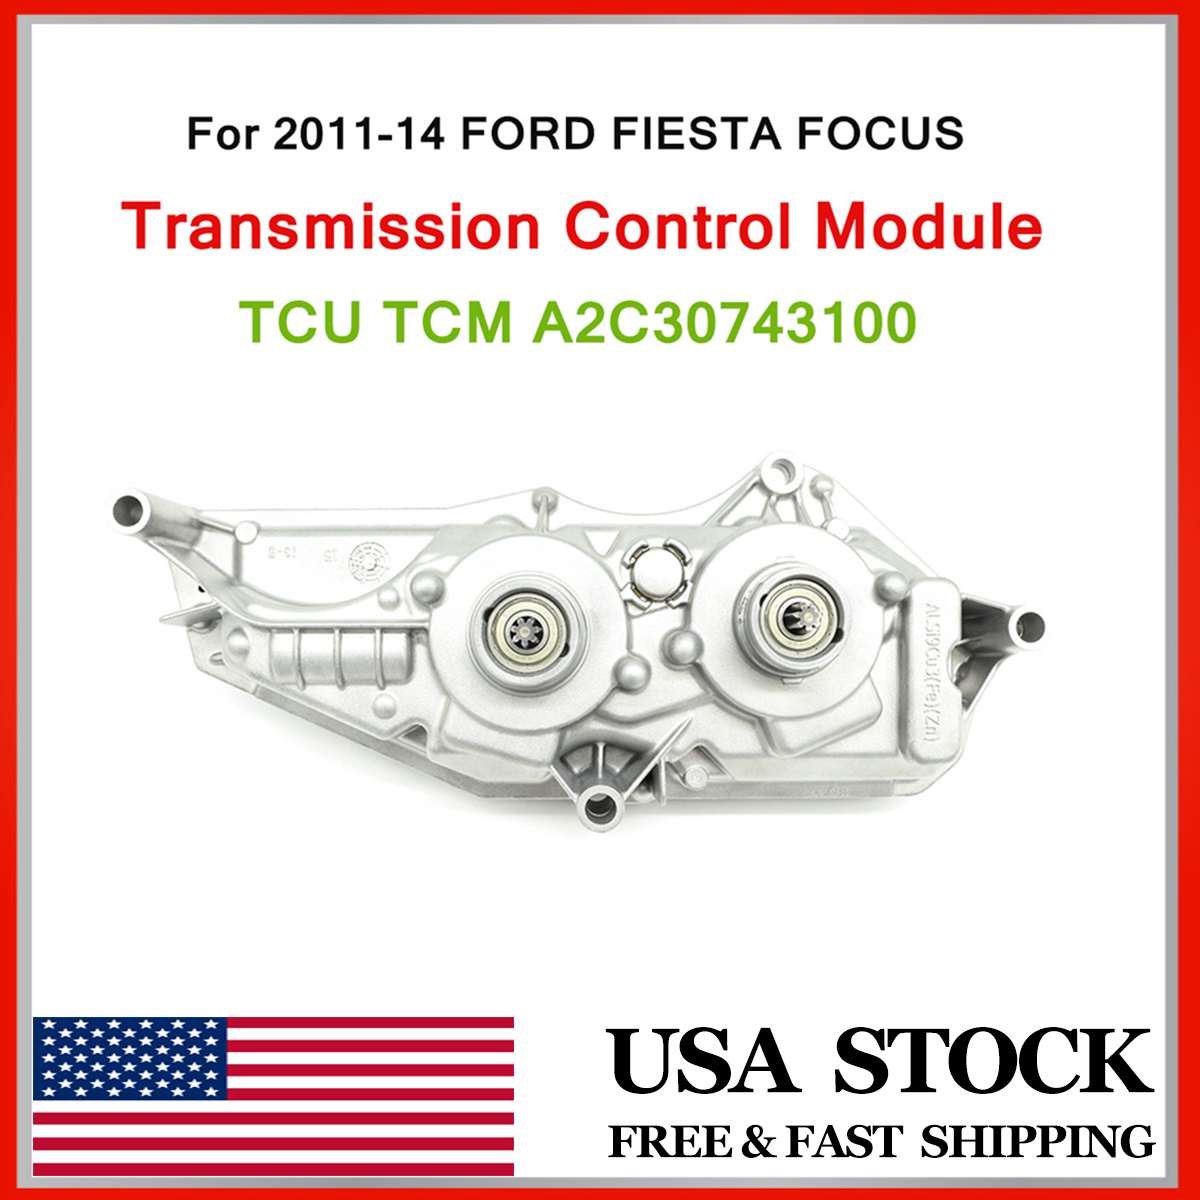 Transmission Control Module For FORDd FOCUS 2011-2014 Transmission Control Module TCU TCM A2C30743100 Control Module TCU TCM